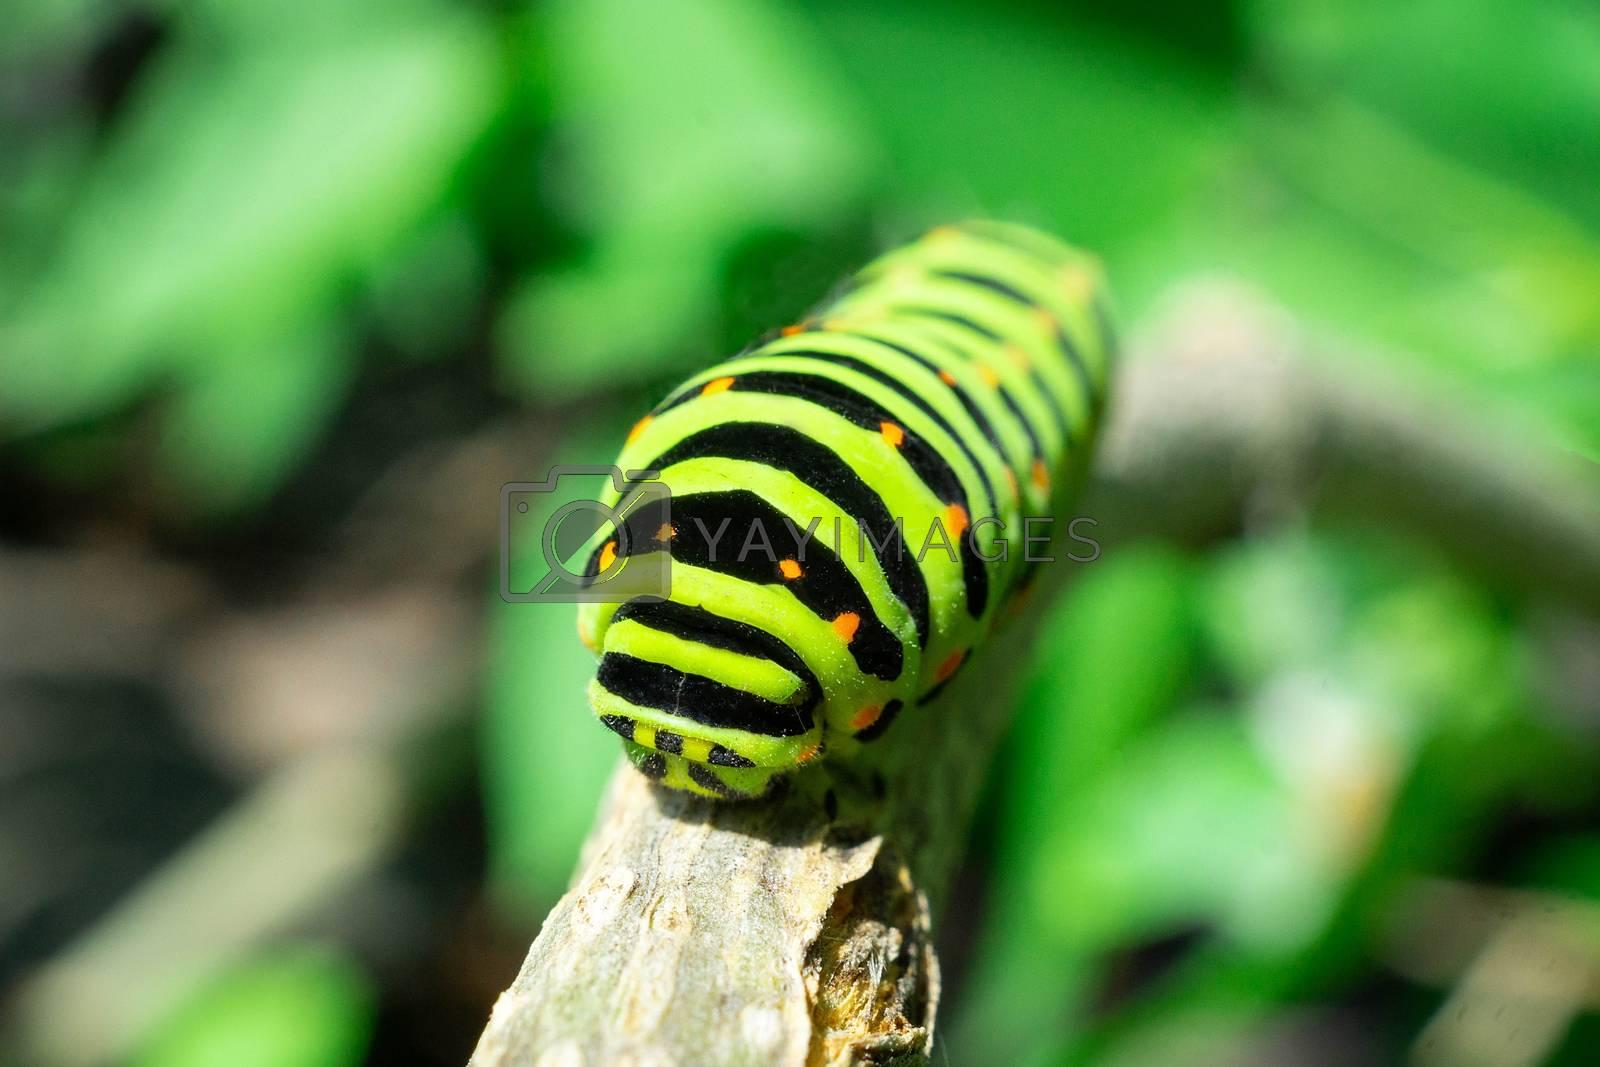 Green caterpillar on lilac leaf, caterpillar in nature